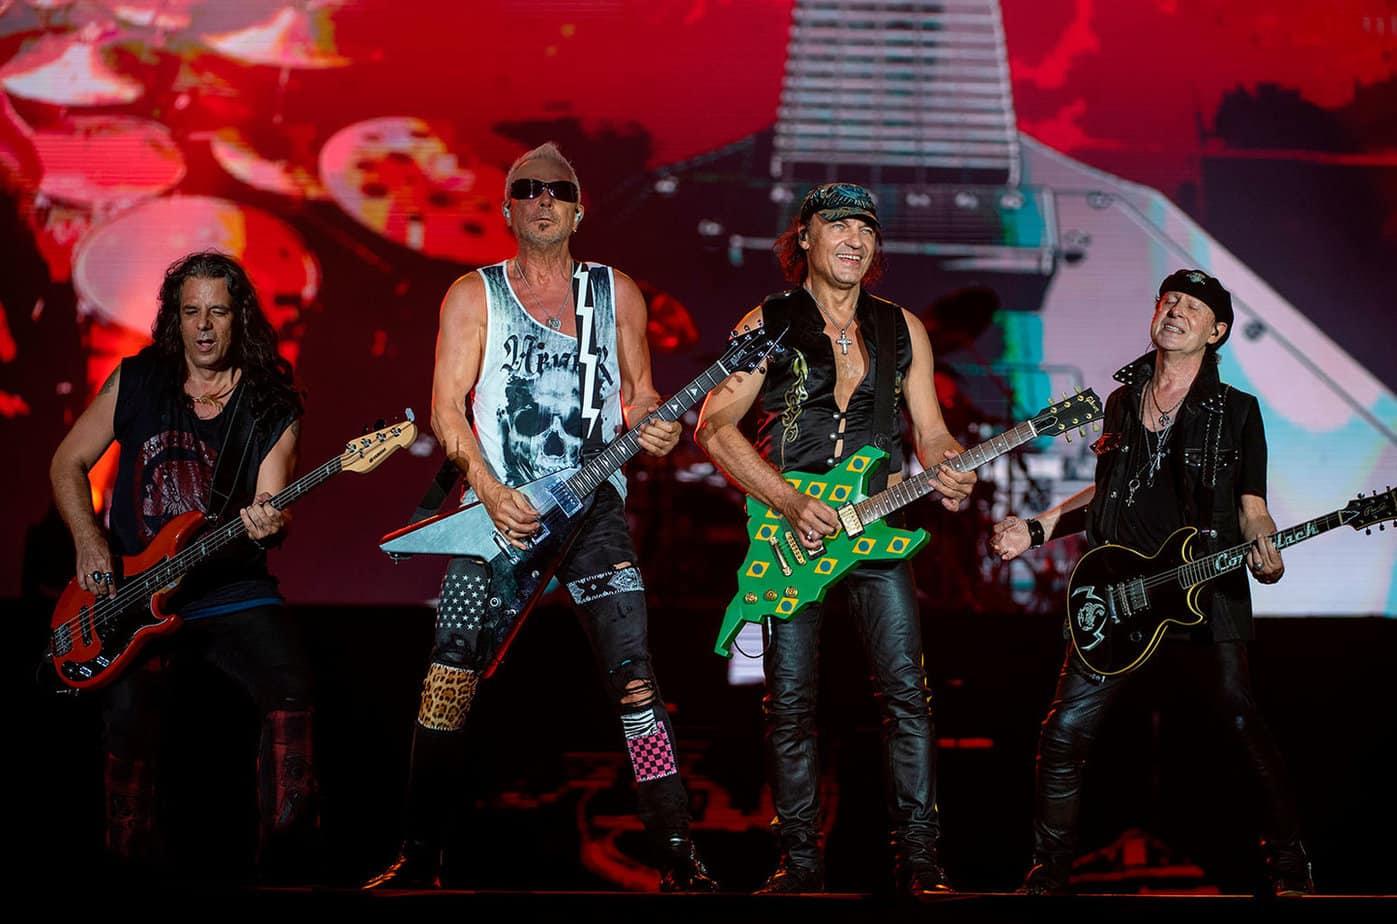 scorpions-canceled-australia-concert